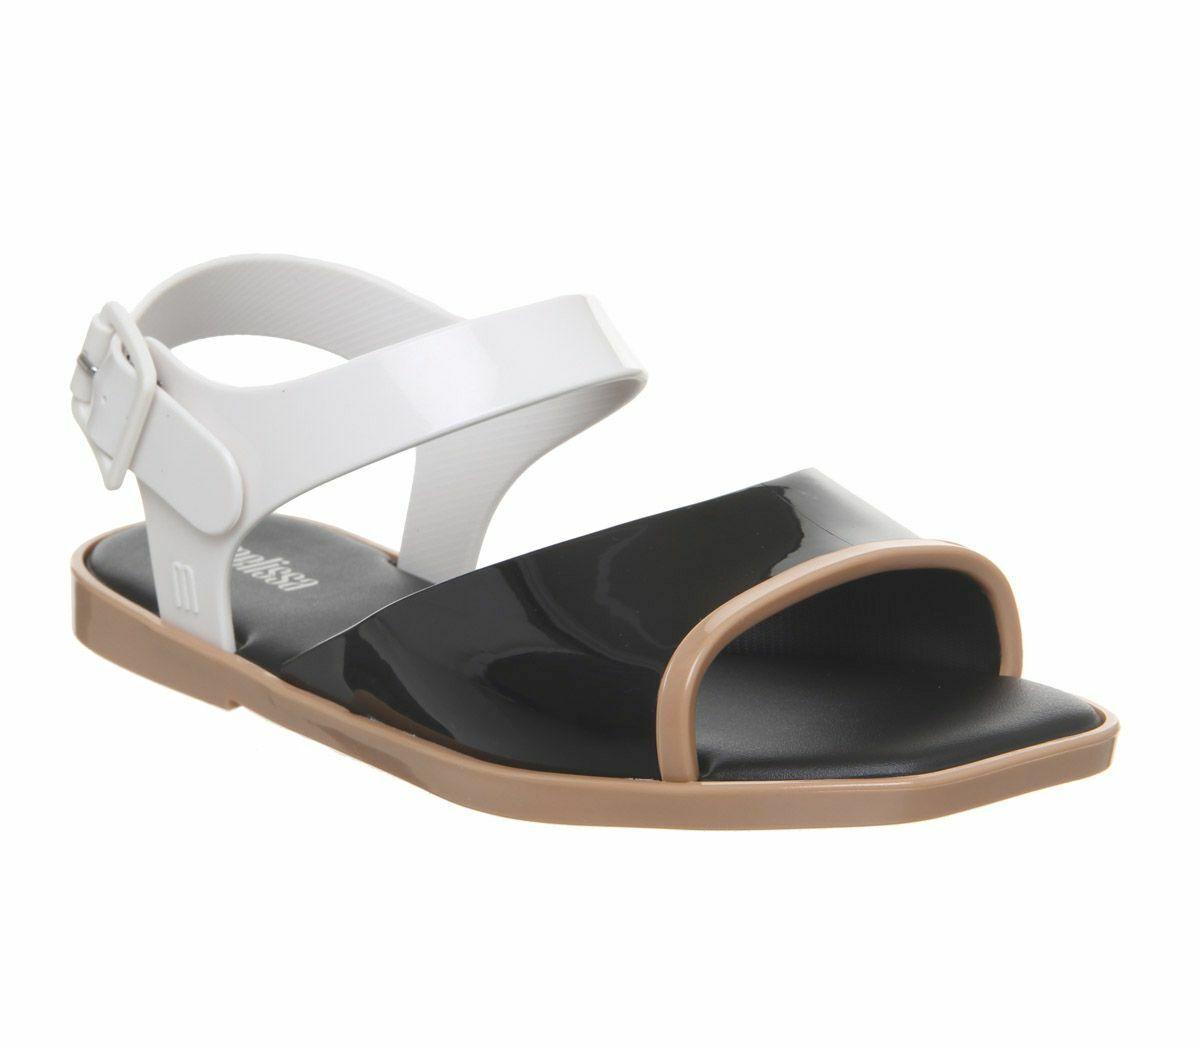 Da Donna Melissa Crush Sandali neri a contrasto scarpe basse